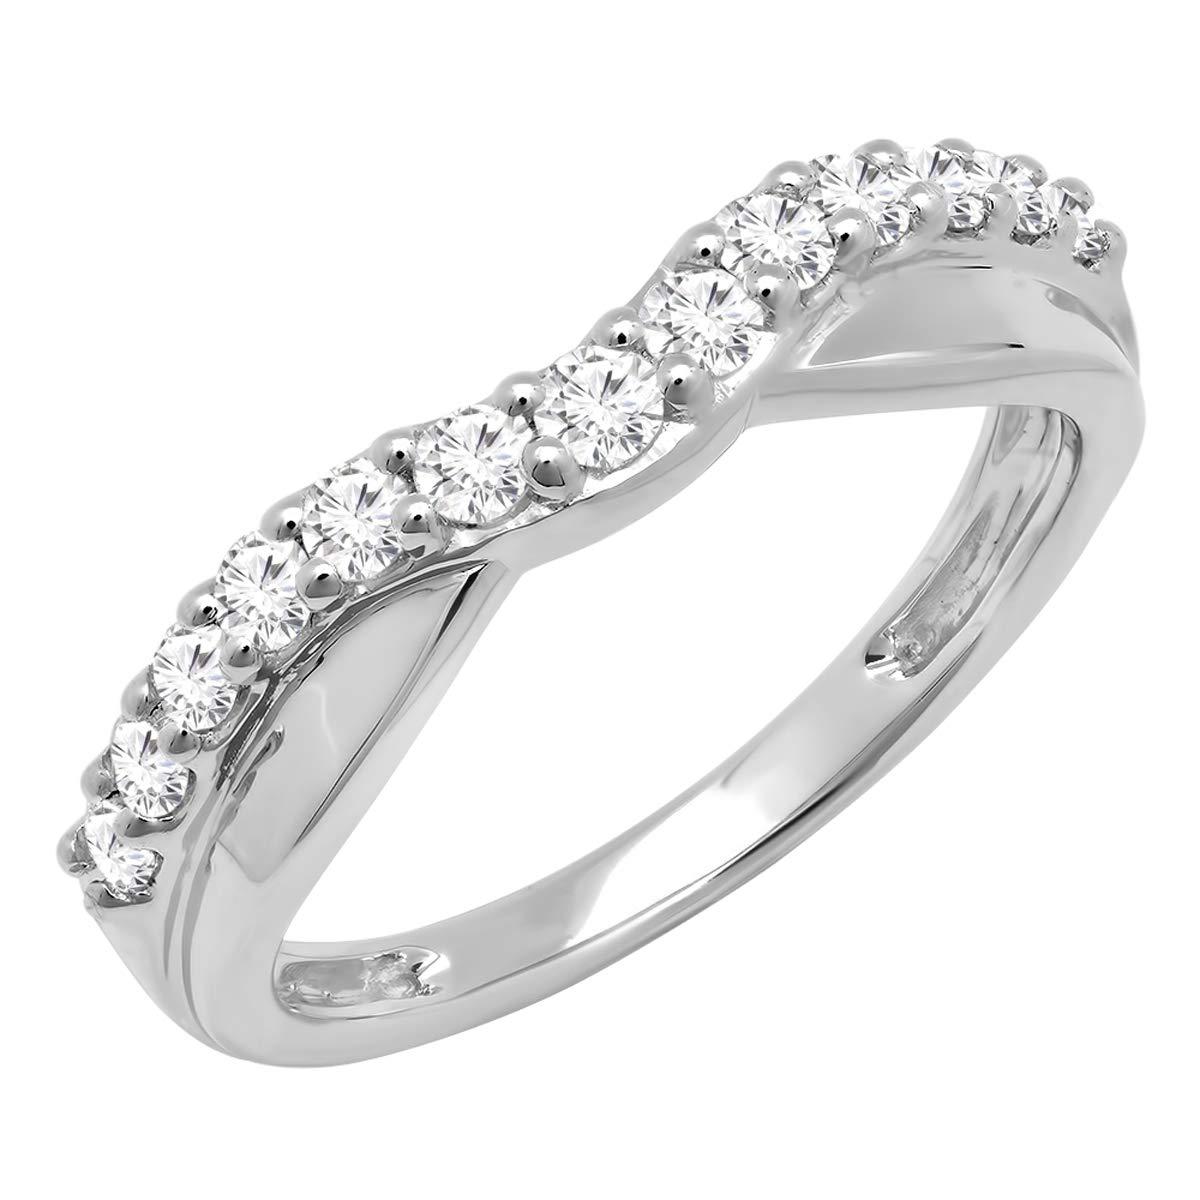 0.55 Carat (ctw) 10K Round Diamond Ladies Wedding Guard Contour Band 1/2 CT, White Gold, Size 7 by Dazzlingrock Collection